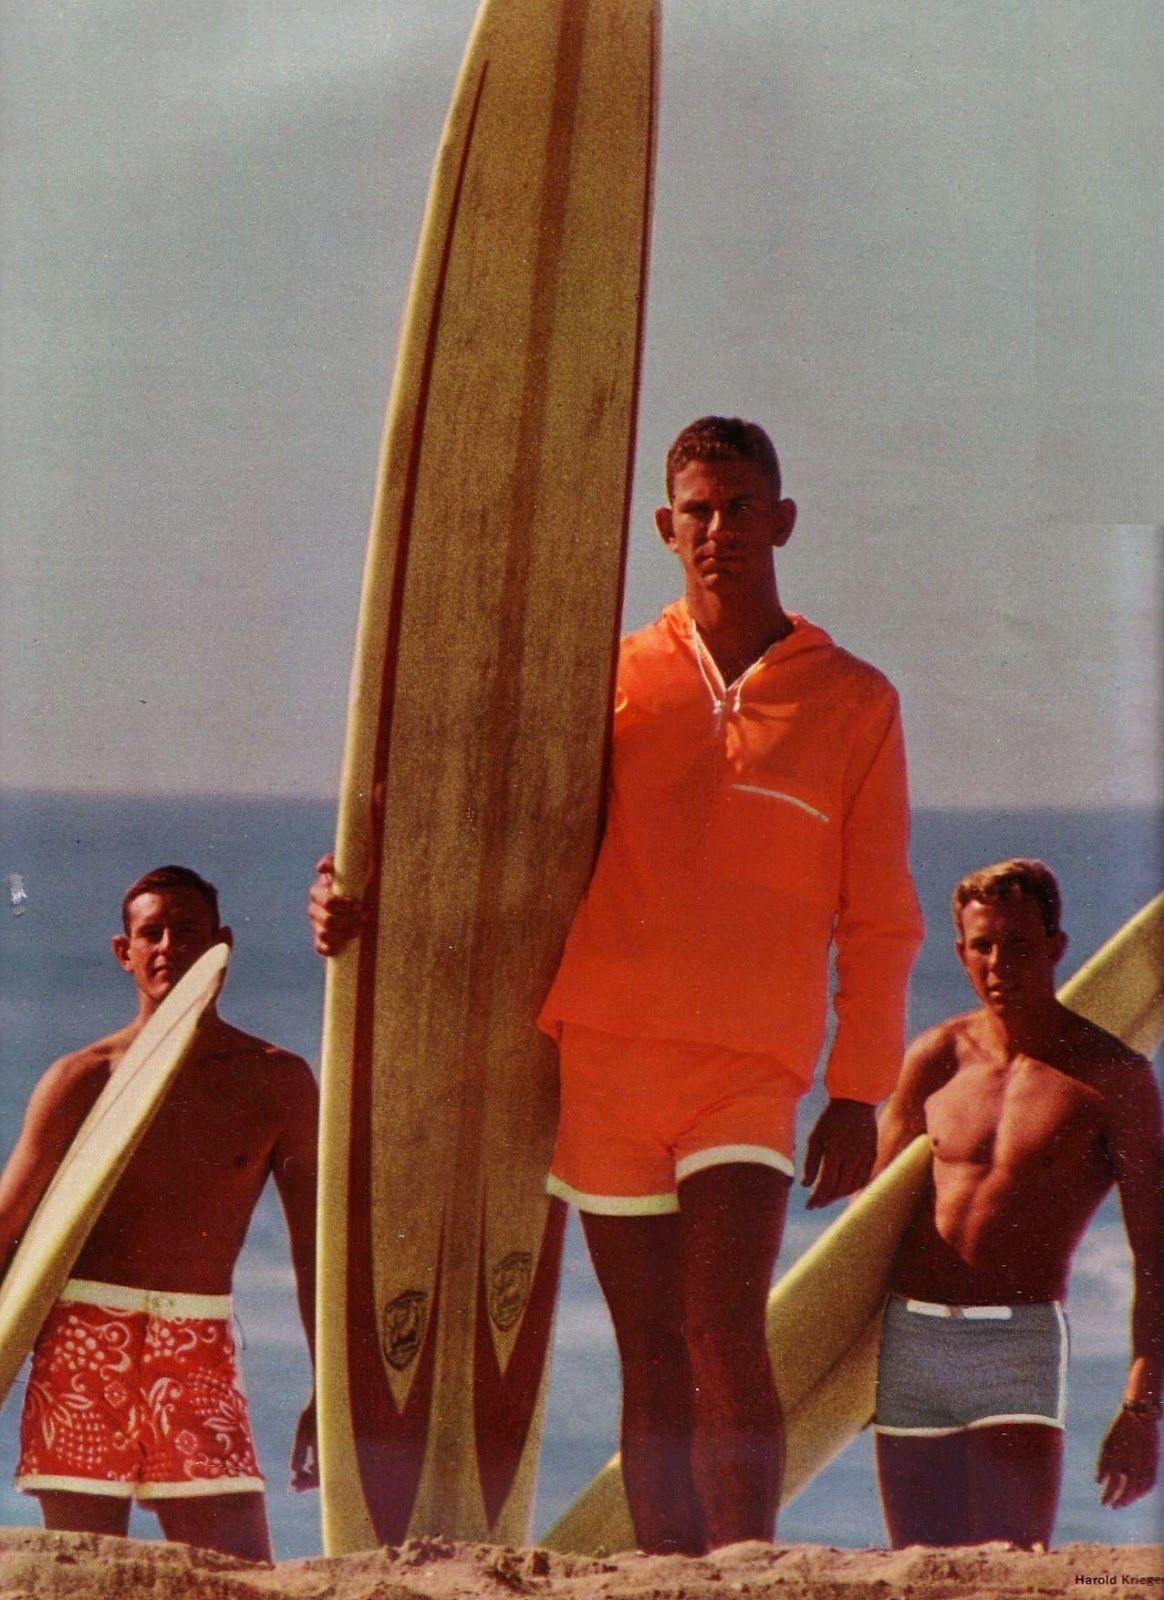 b9bf511eb8e5f Glamoursplash  1060s Surfer boys in Catalina